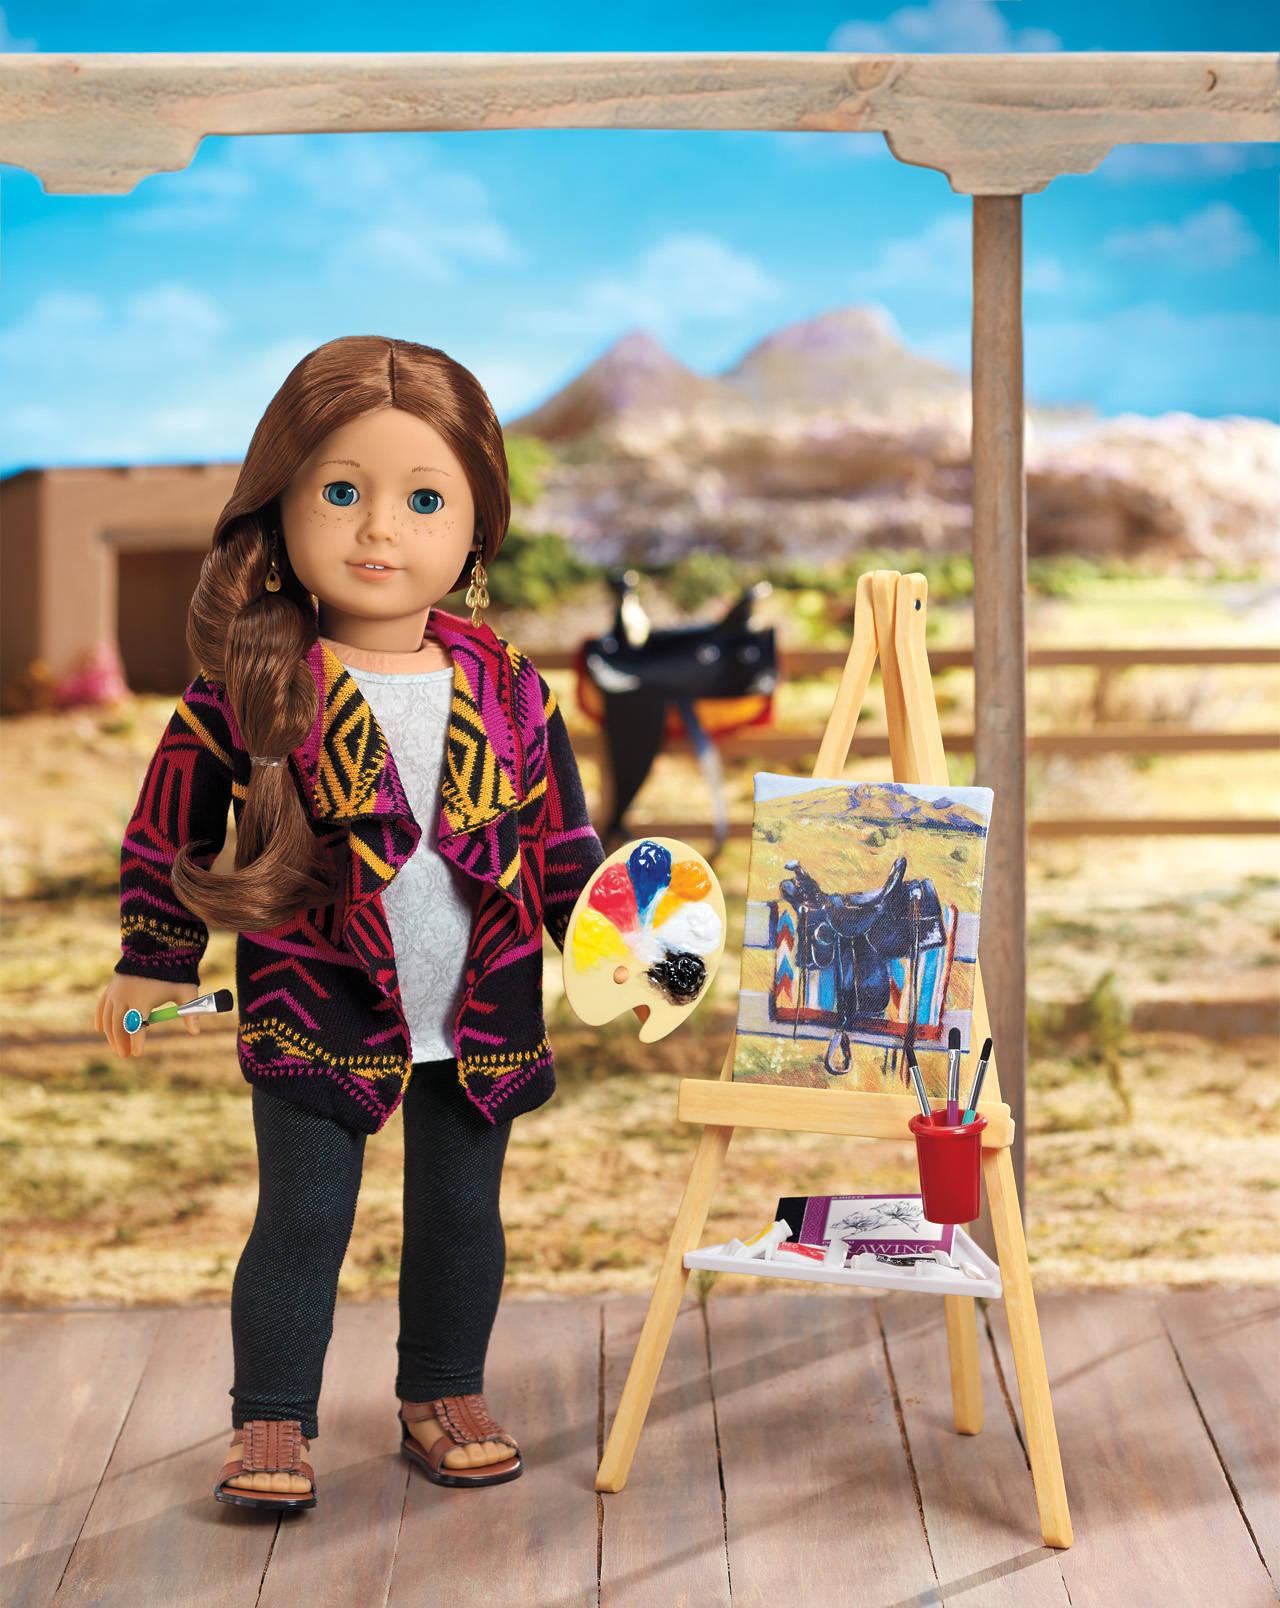 American Girl S New Nasa Advised Doll Is Aspiring: American Girl Doll